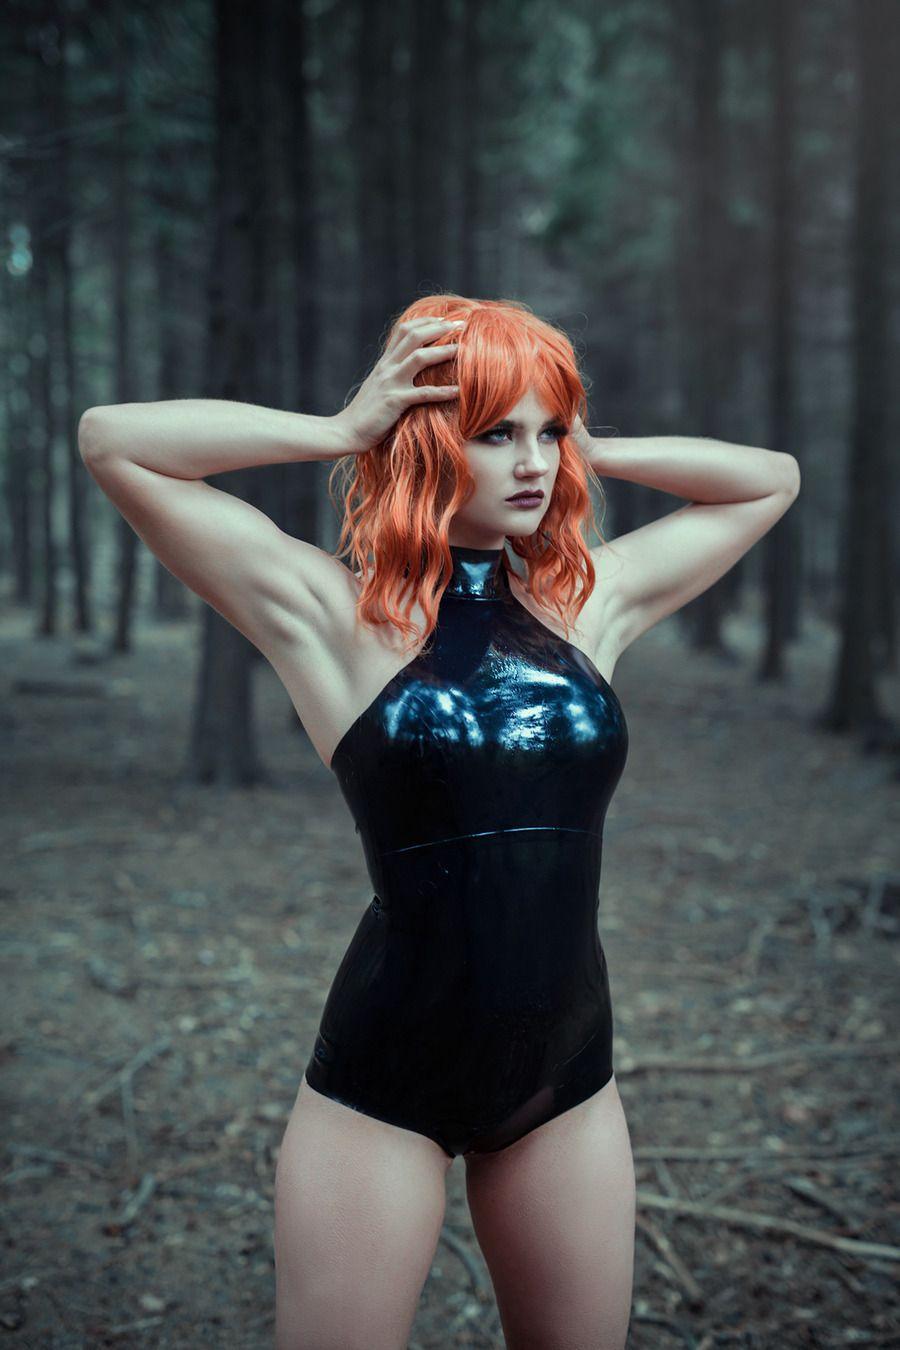 alt-amores:Chaos Isi by Rafael Gruber | Goth women, Goth